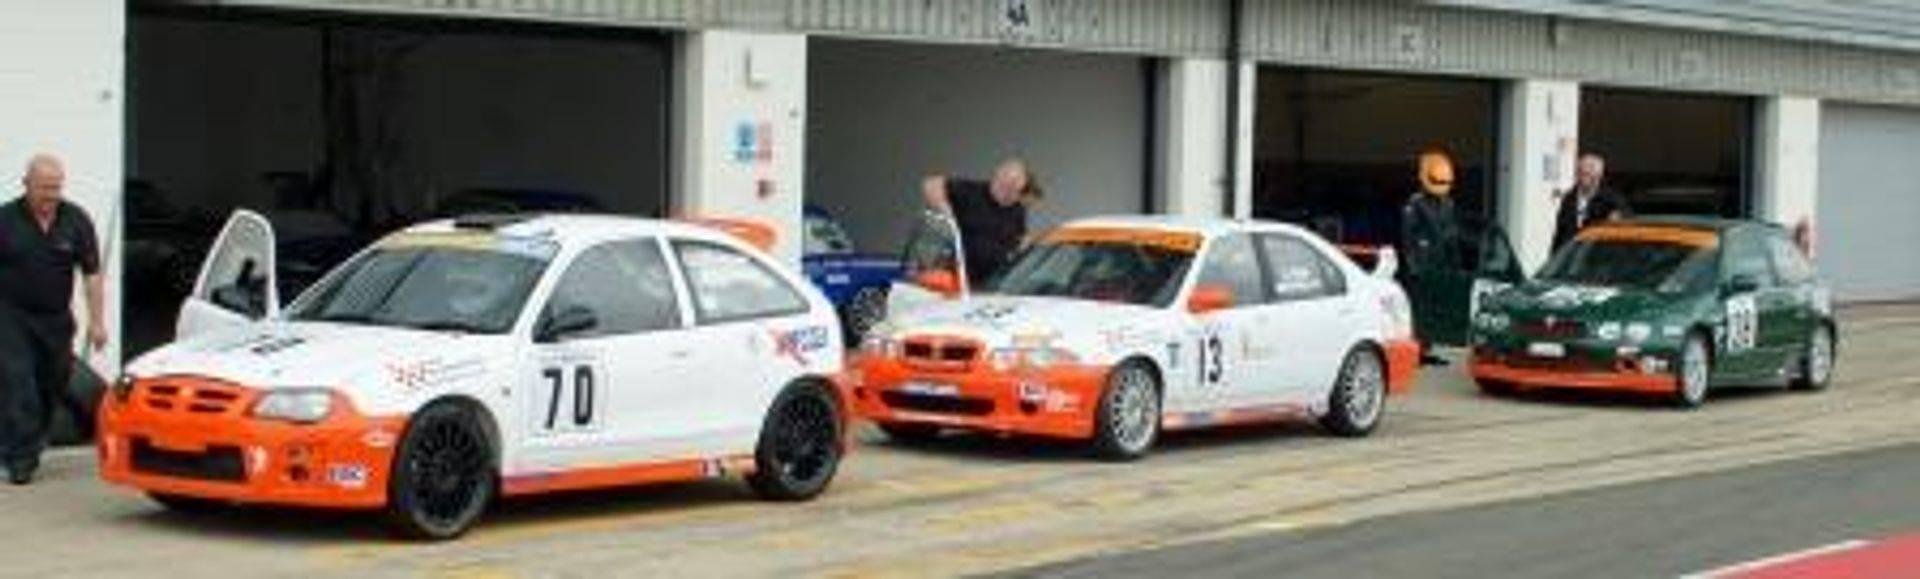 Vulcan Racing team cars MGZS Peter Burchill, MGZR 190 Dan Ludlow & MGZR 160 Dave Brown